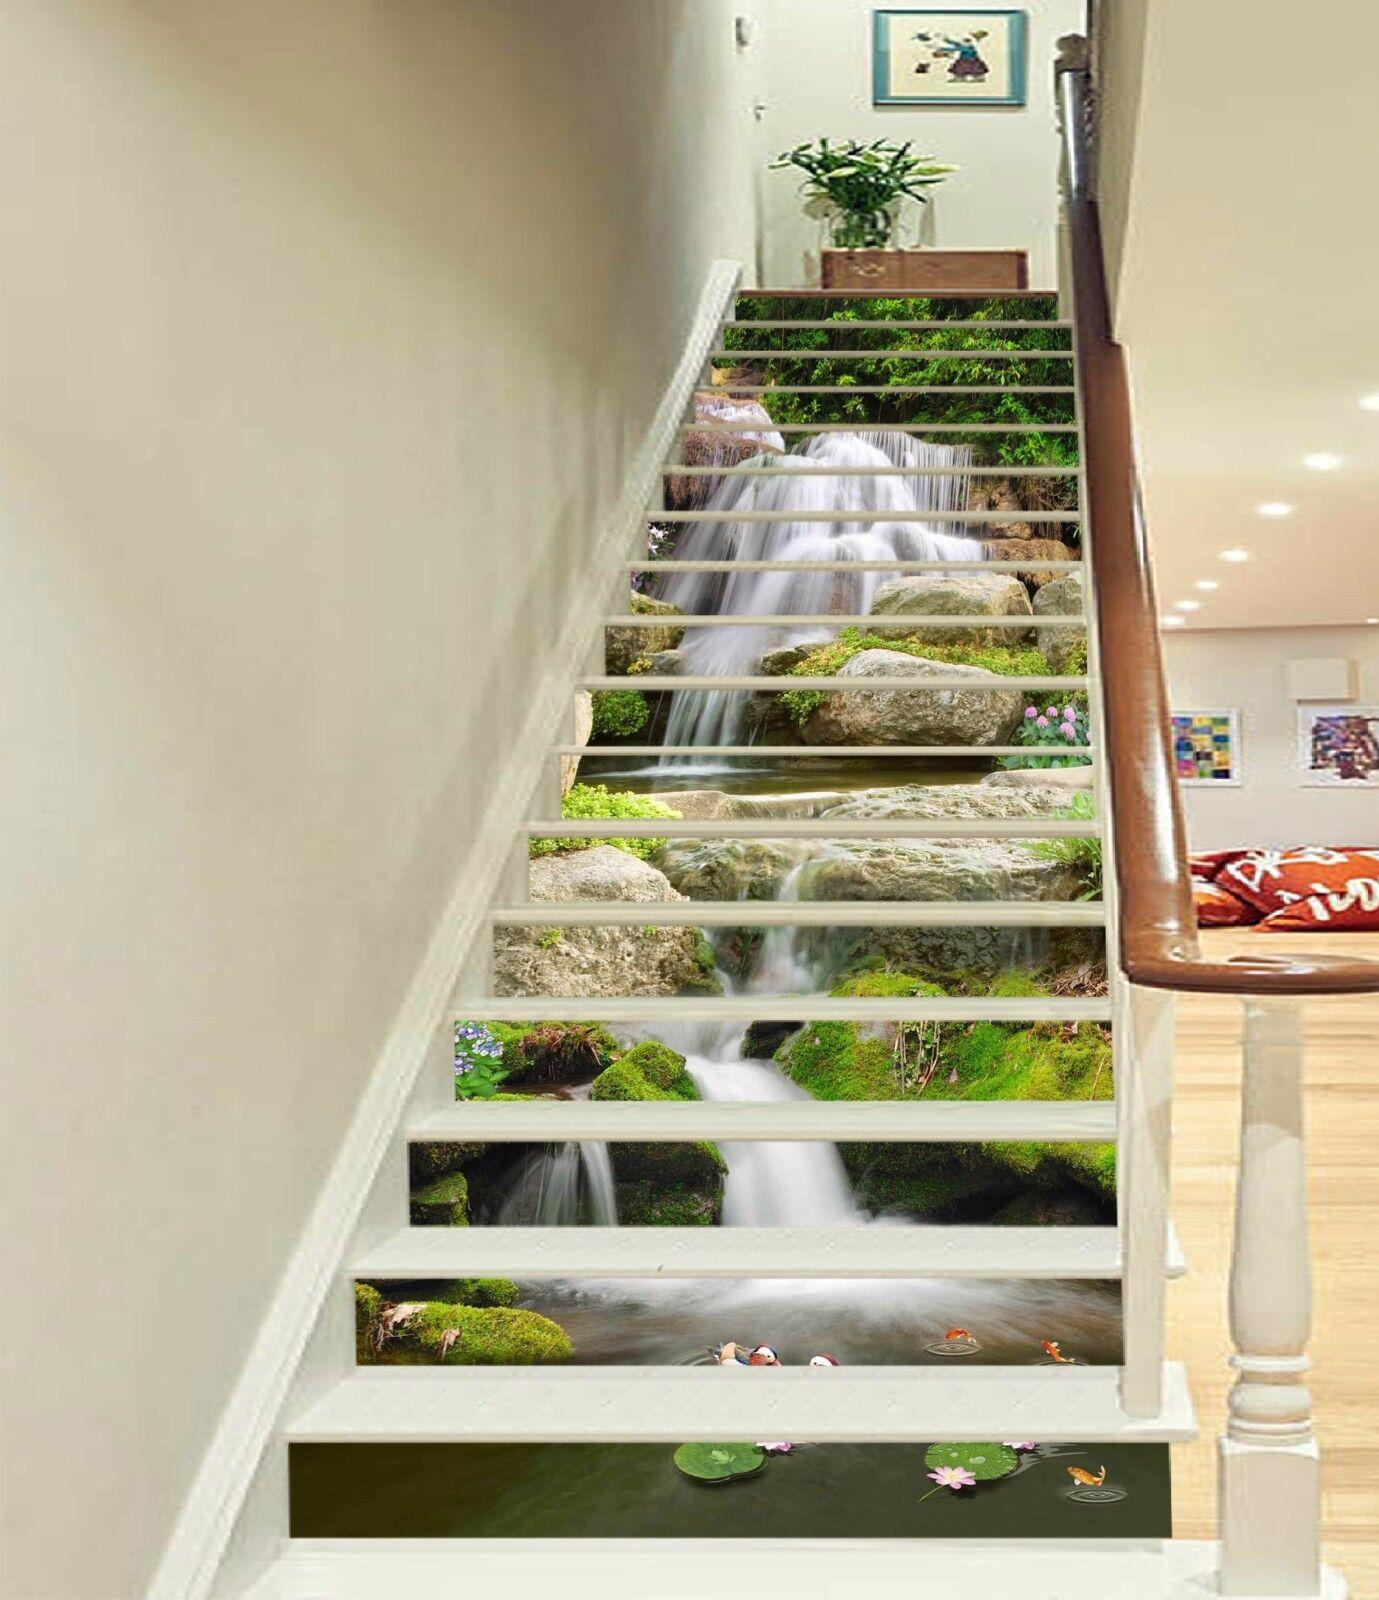 3D Stony Creek 026 Stair Risers Decoration Photo Mural Vinyl Decal Wallpaper AU